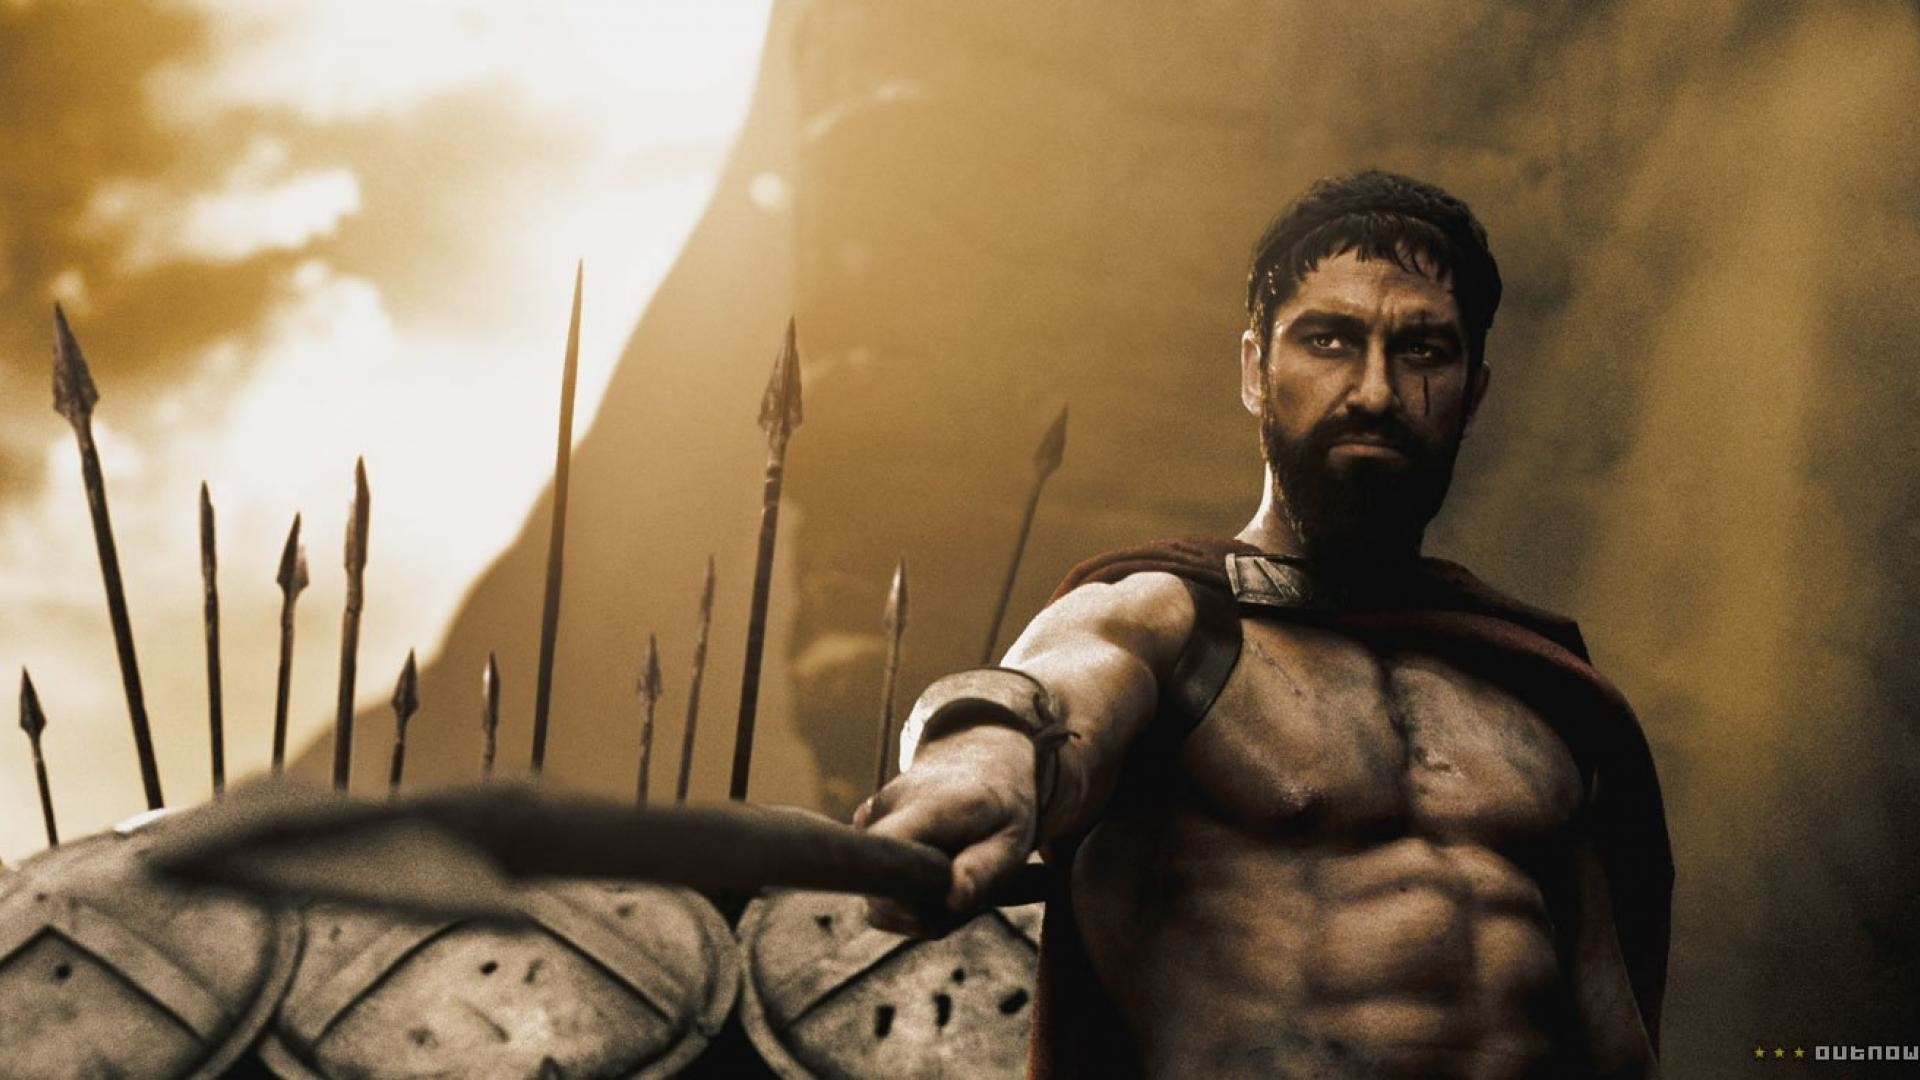 анализа открытки 300 спартанцев зависимости причинного фактора